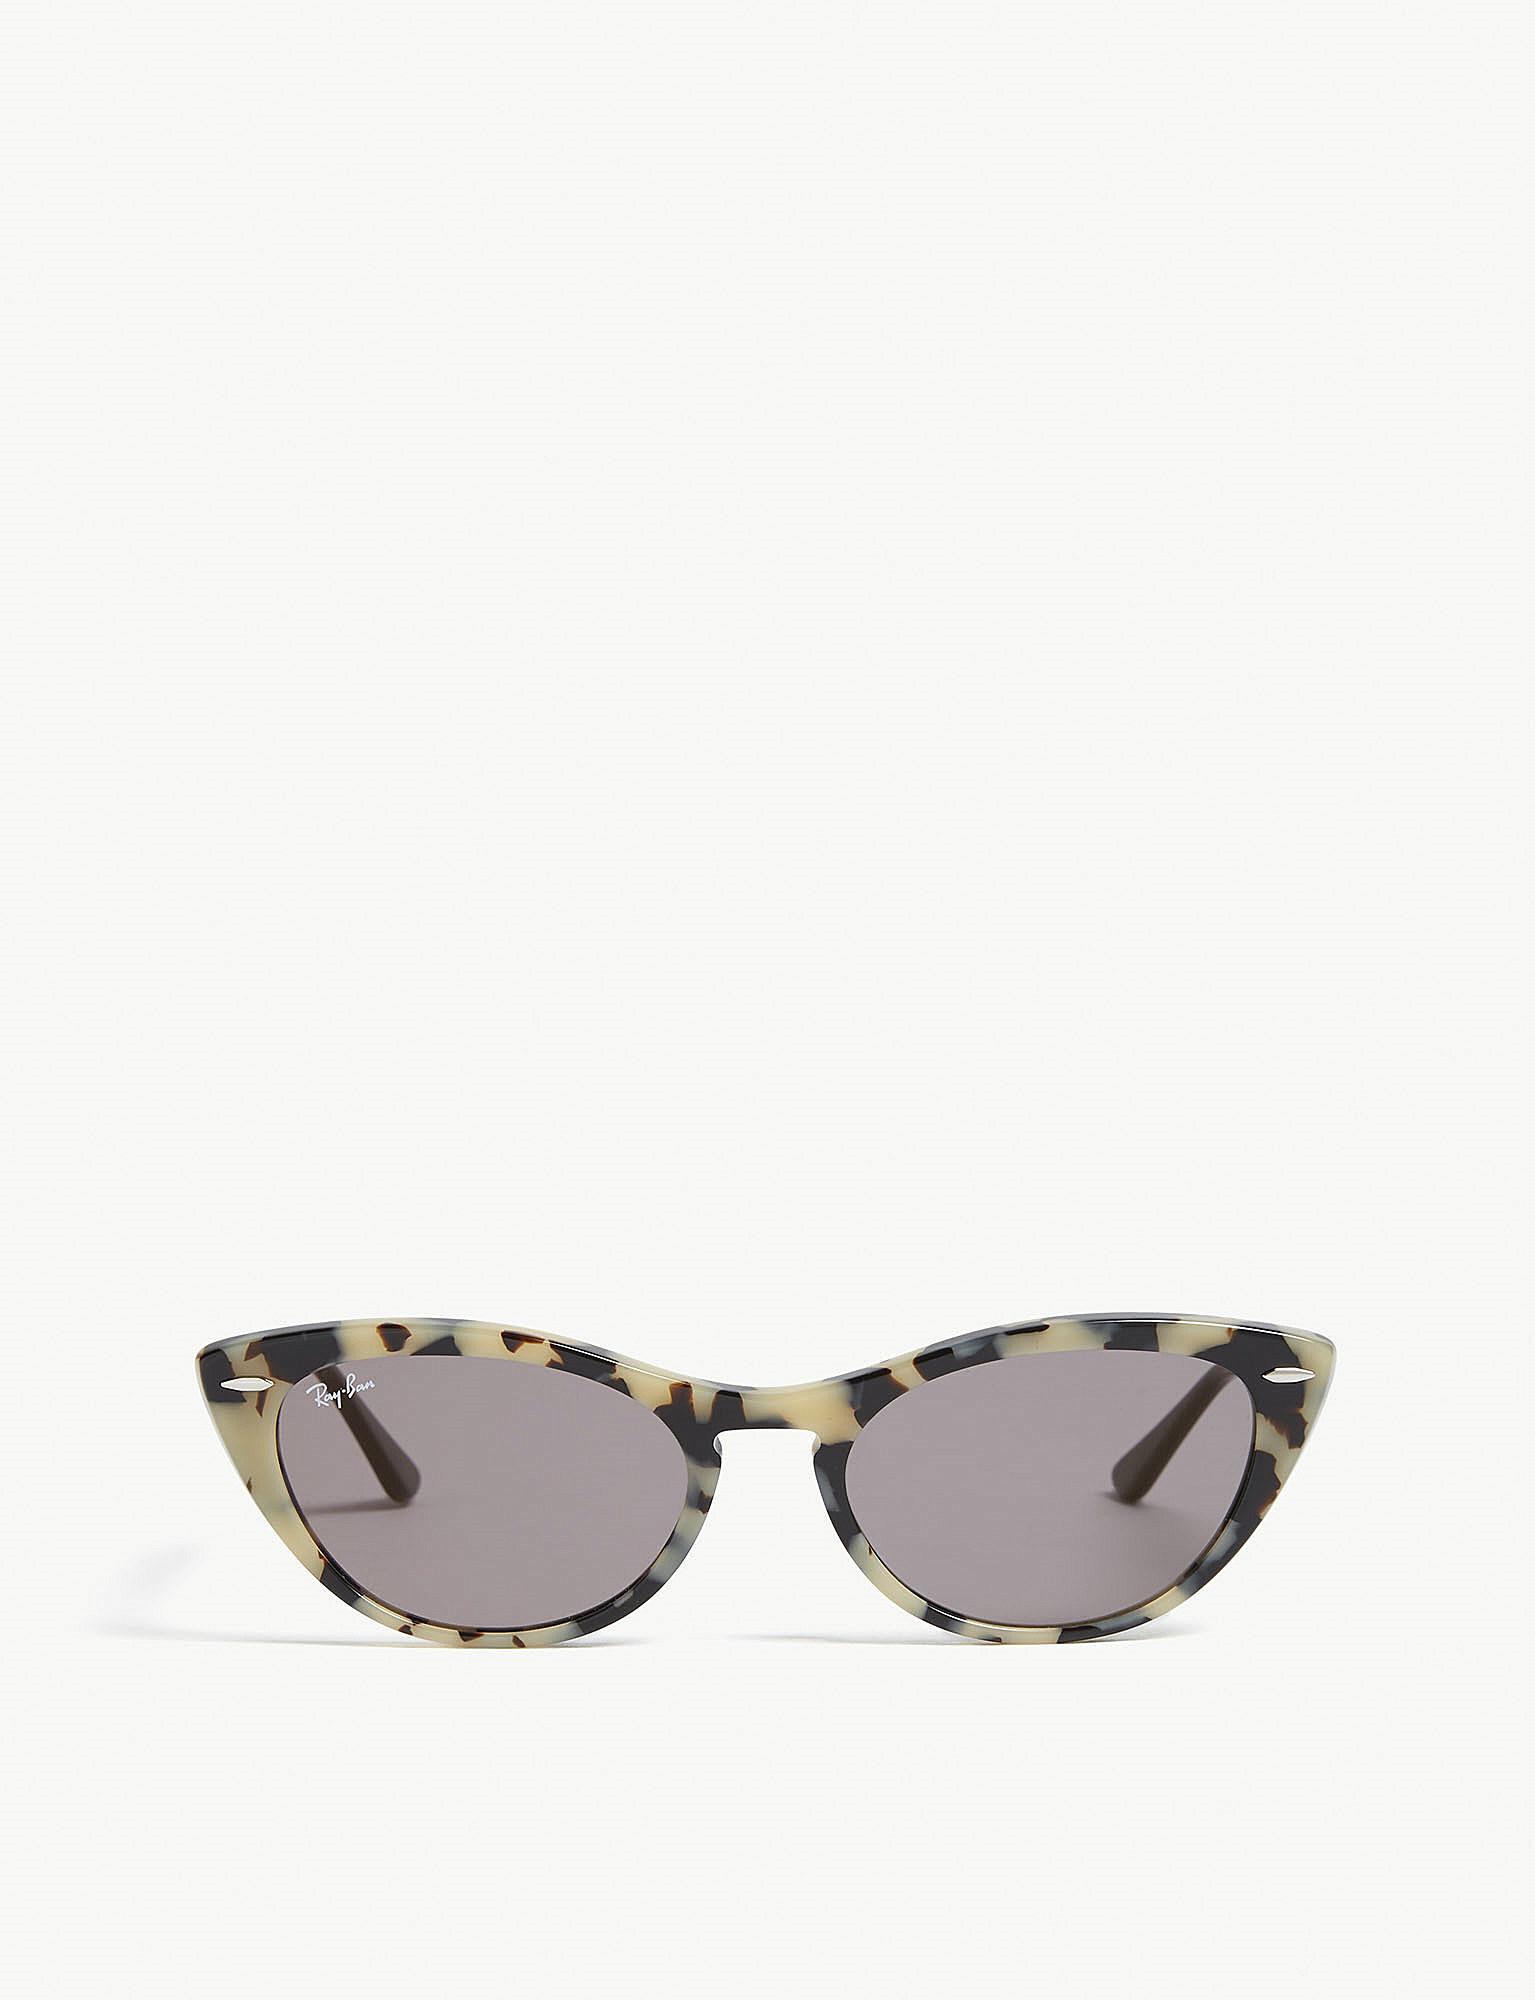 528a646160 Ray-Ban. Women s Havana Rb4314 Cat Eye Sunglasses